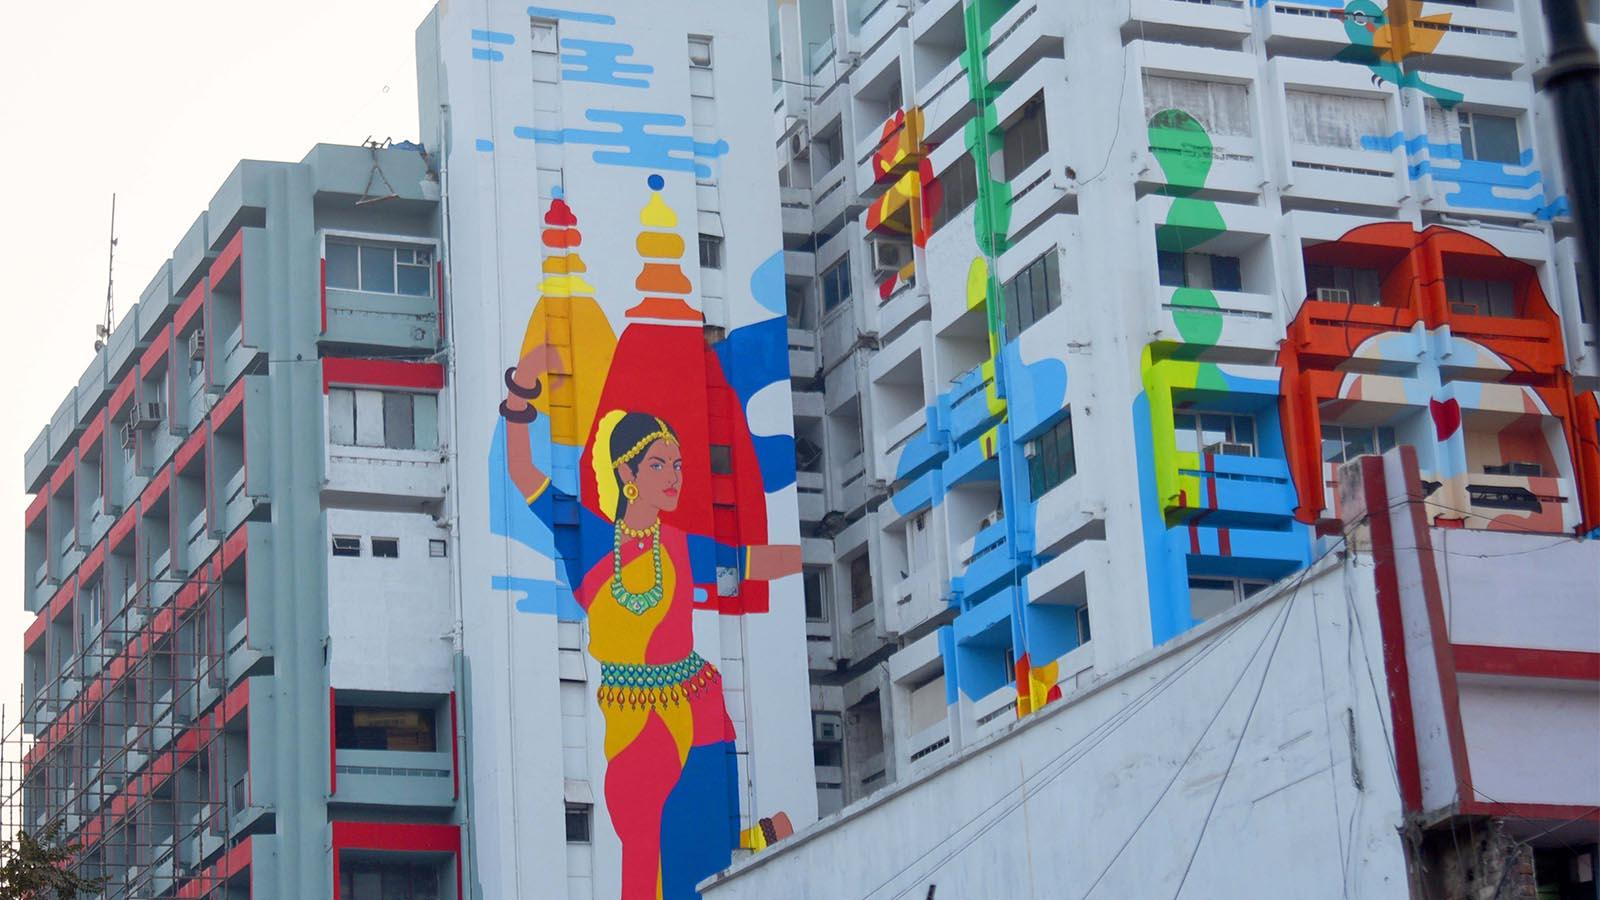 High-rises too get a splash of colour